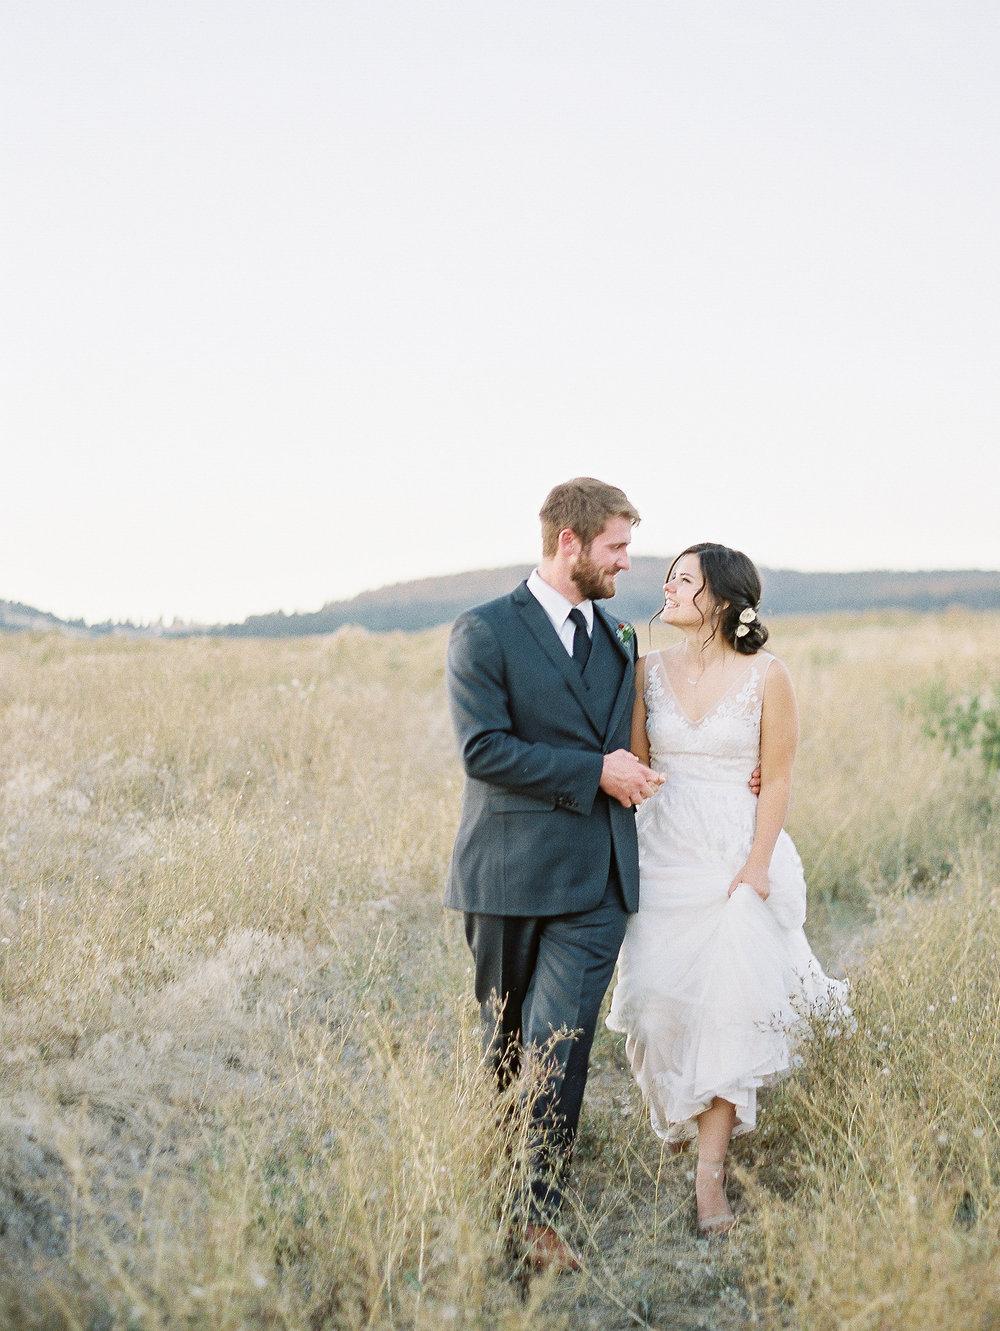 Idaho-Field-Forest-Wedding-Film-Photographer-Kristina-Adams-770 (1).jpg